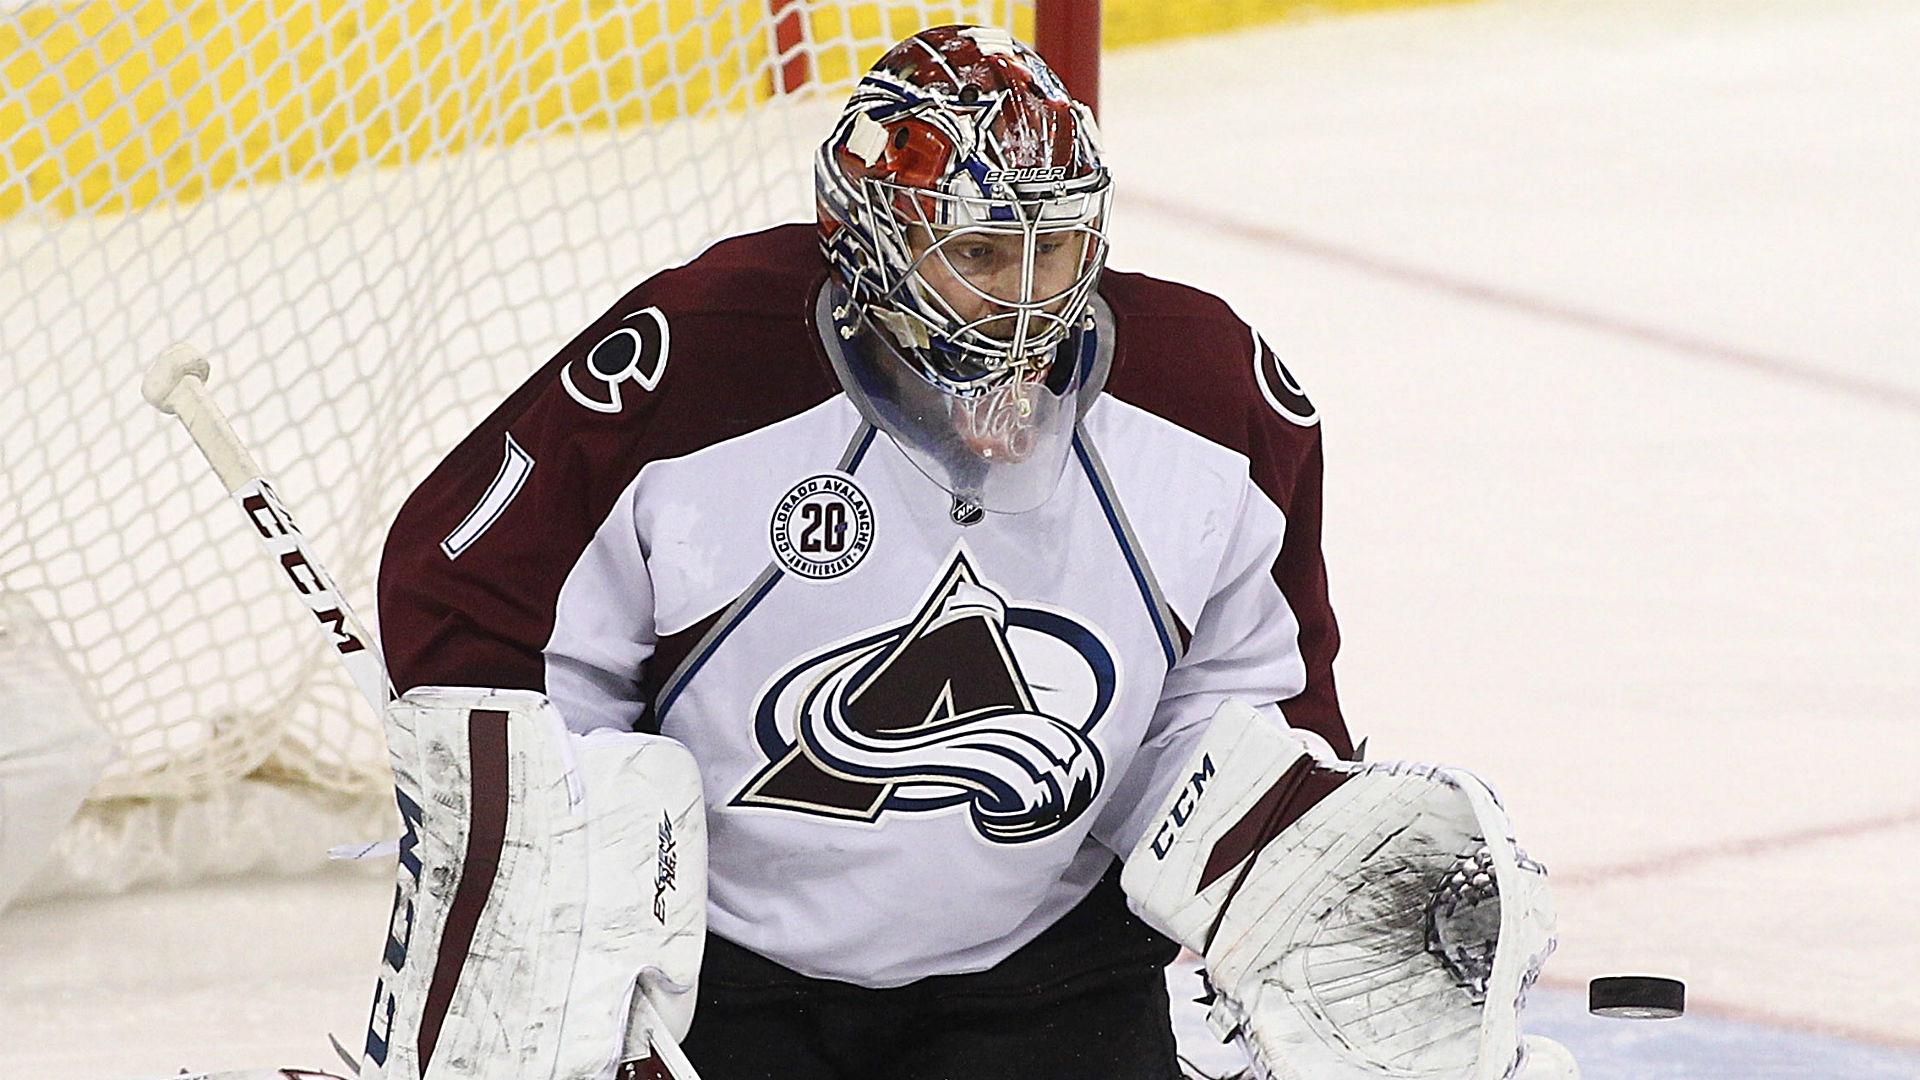 Arrest and indictment of Semen Varlamov 48